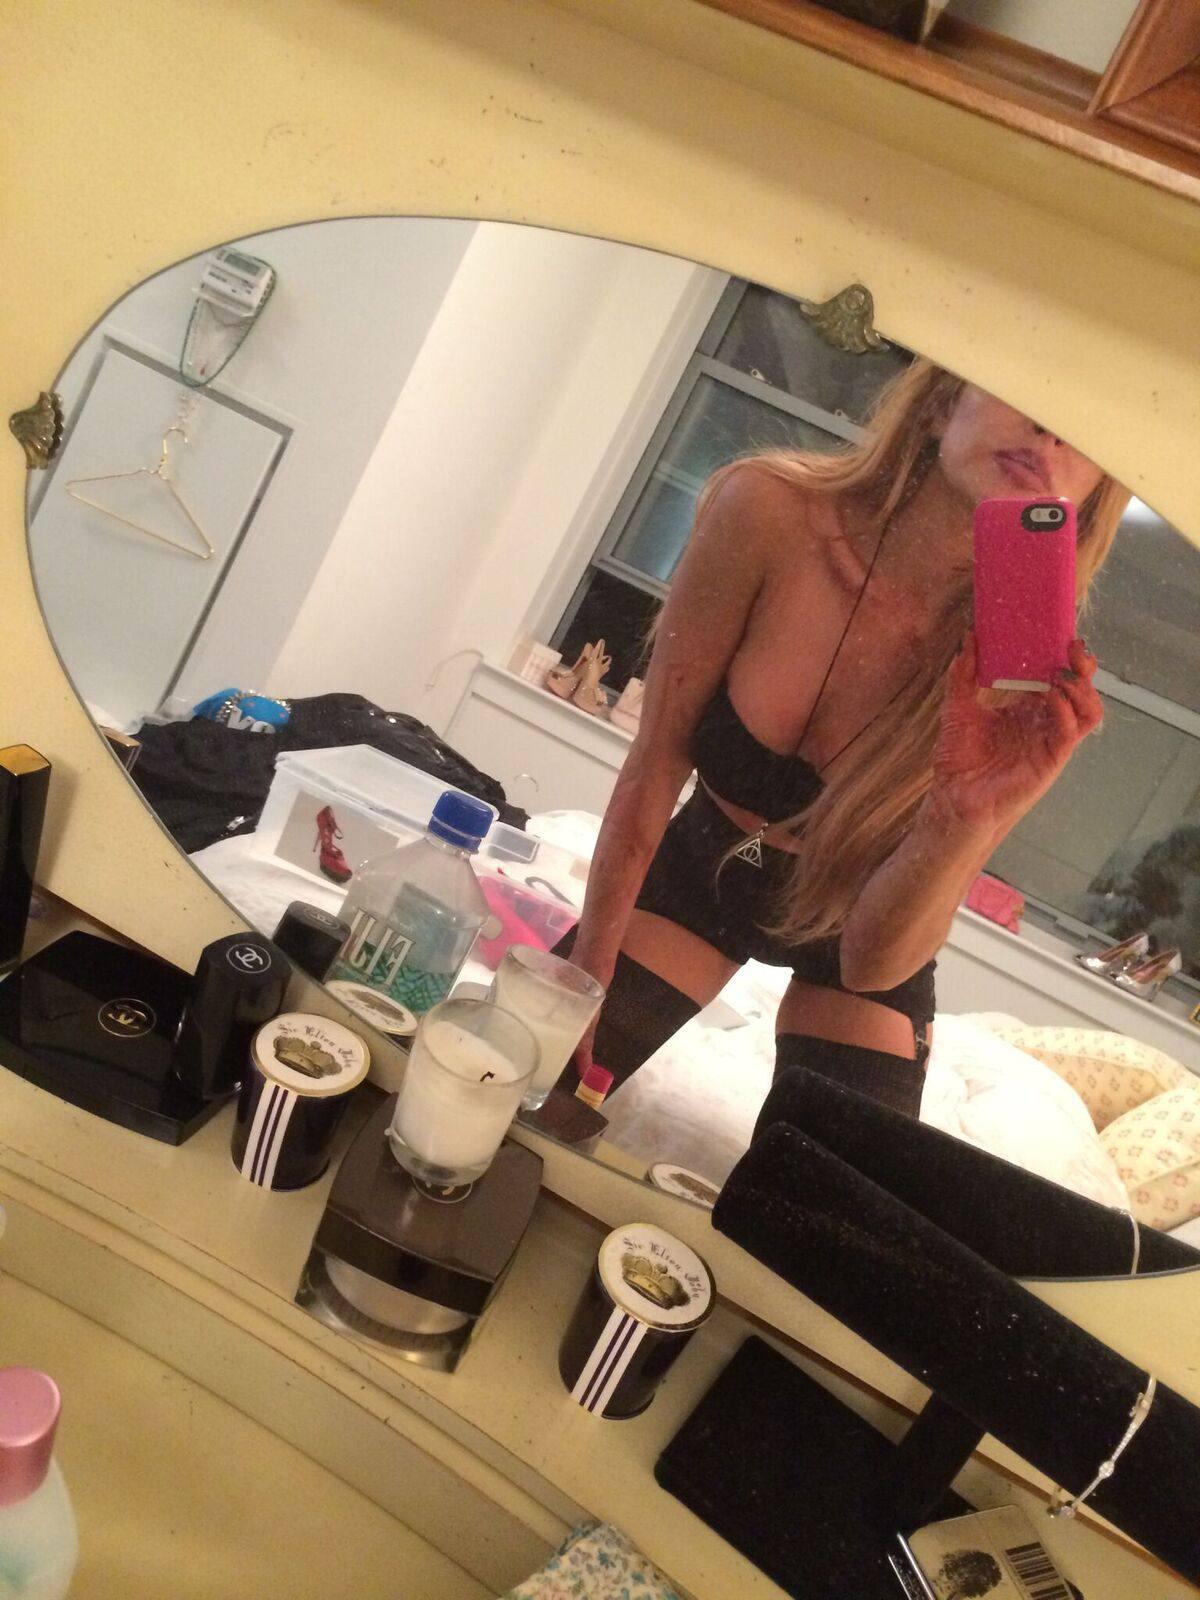 Lindsay Lohan Naked Private Pics